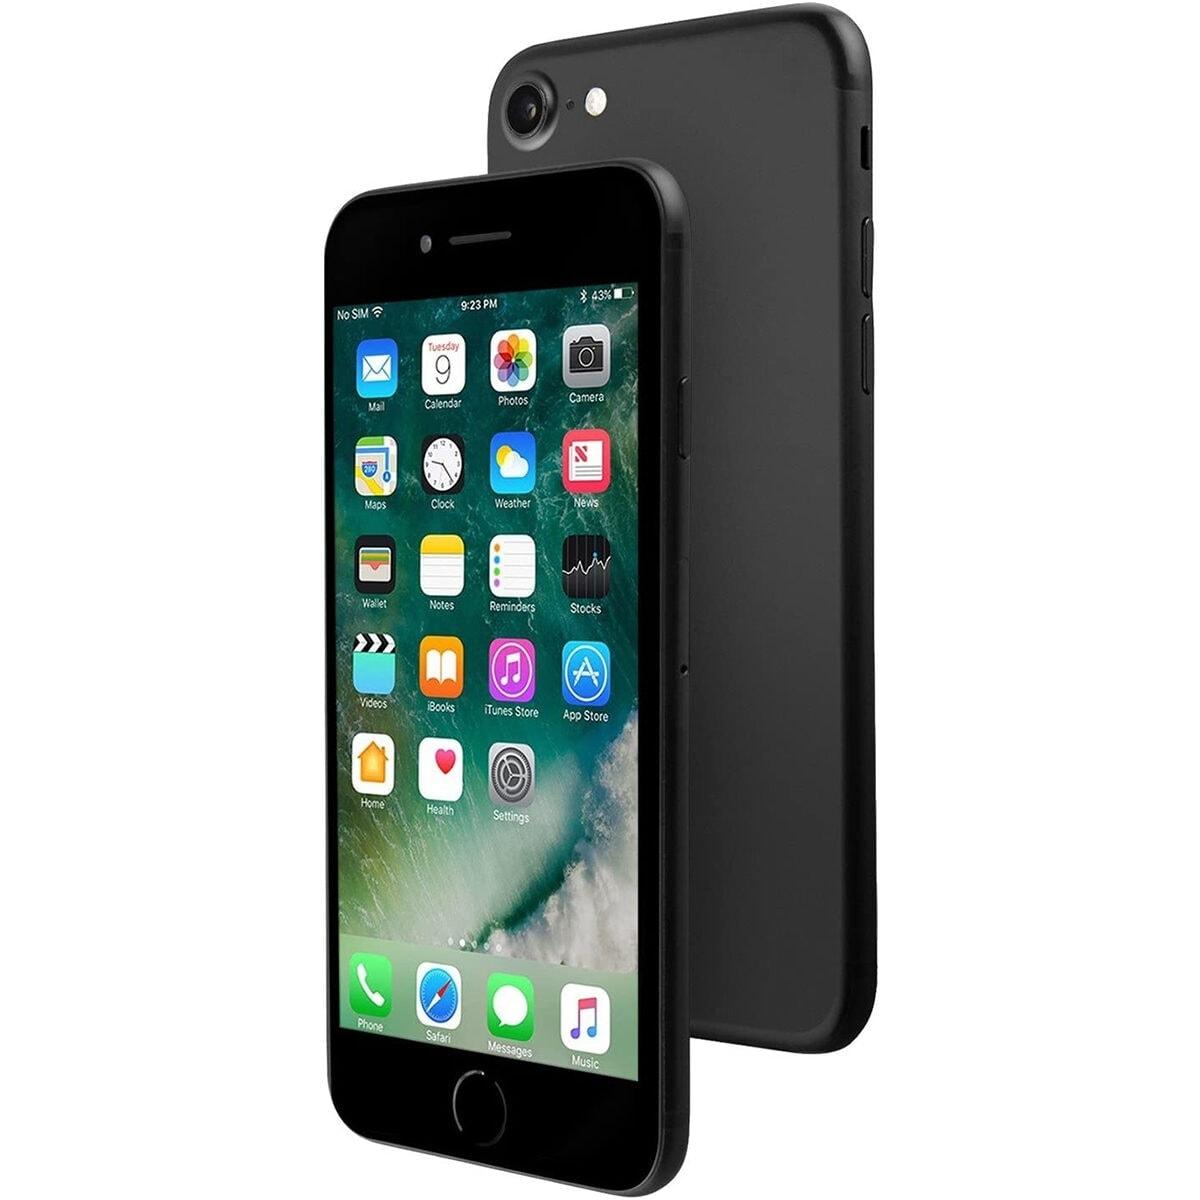 Apple IPhone 7 Black 32GB Unlocked Sim-Free Retina Mobile Phone Refurbished 12 Months Warranty